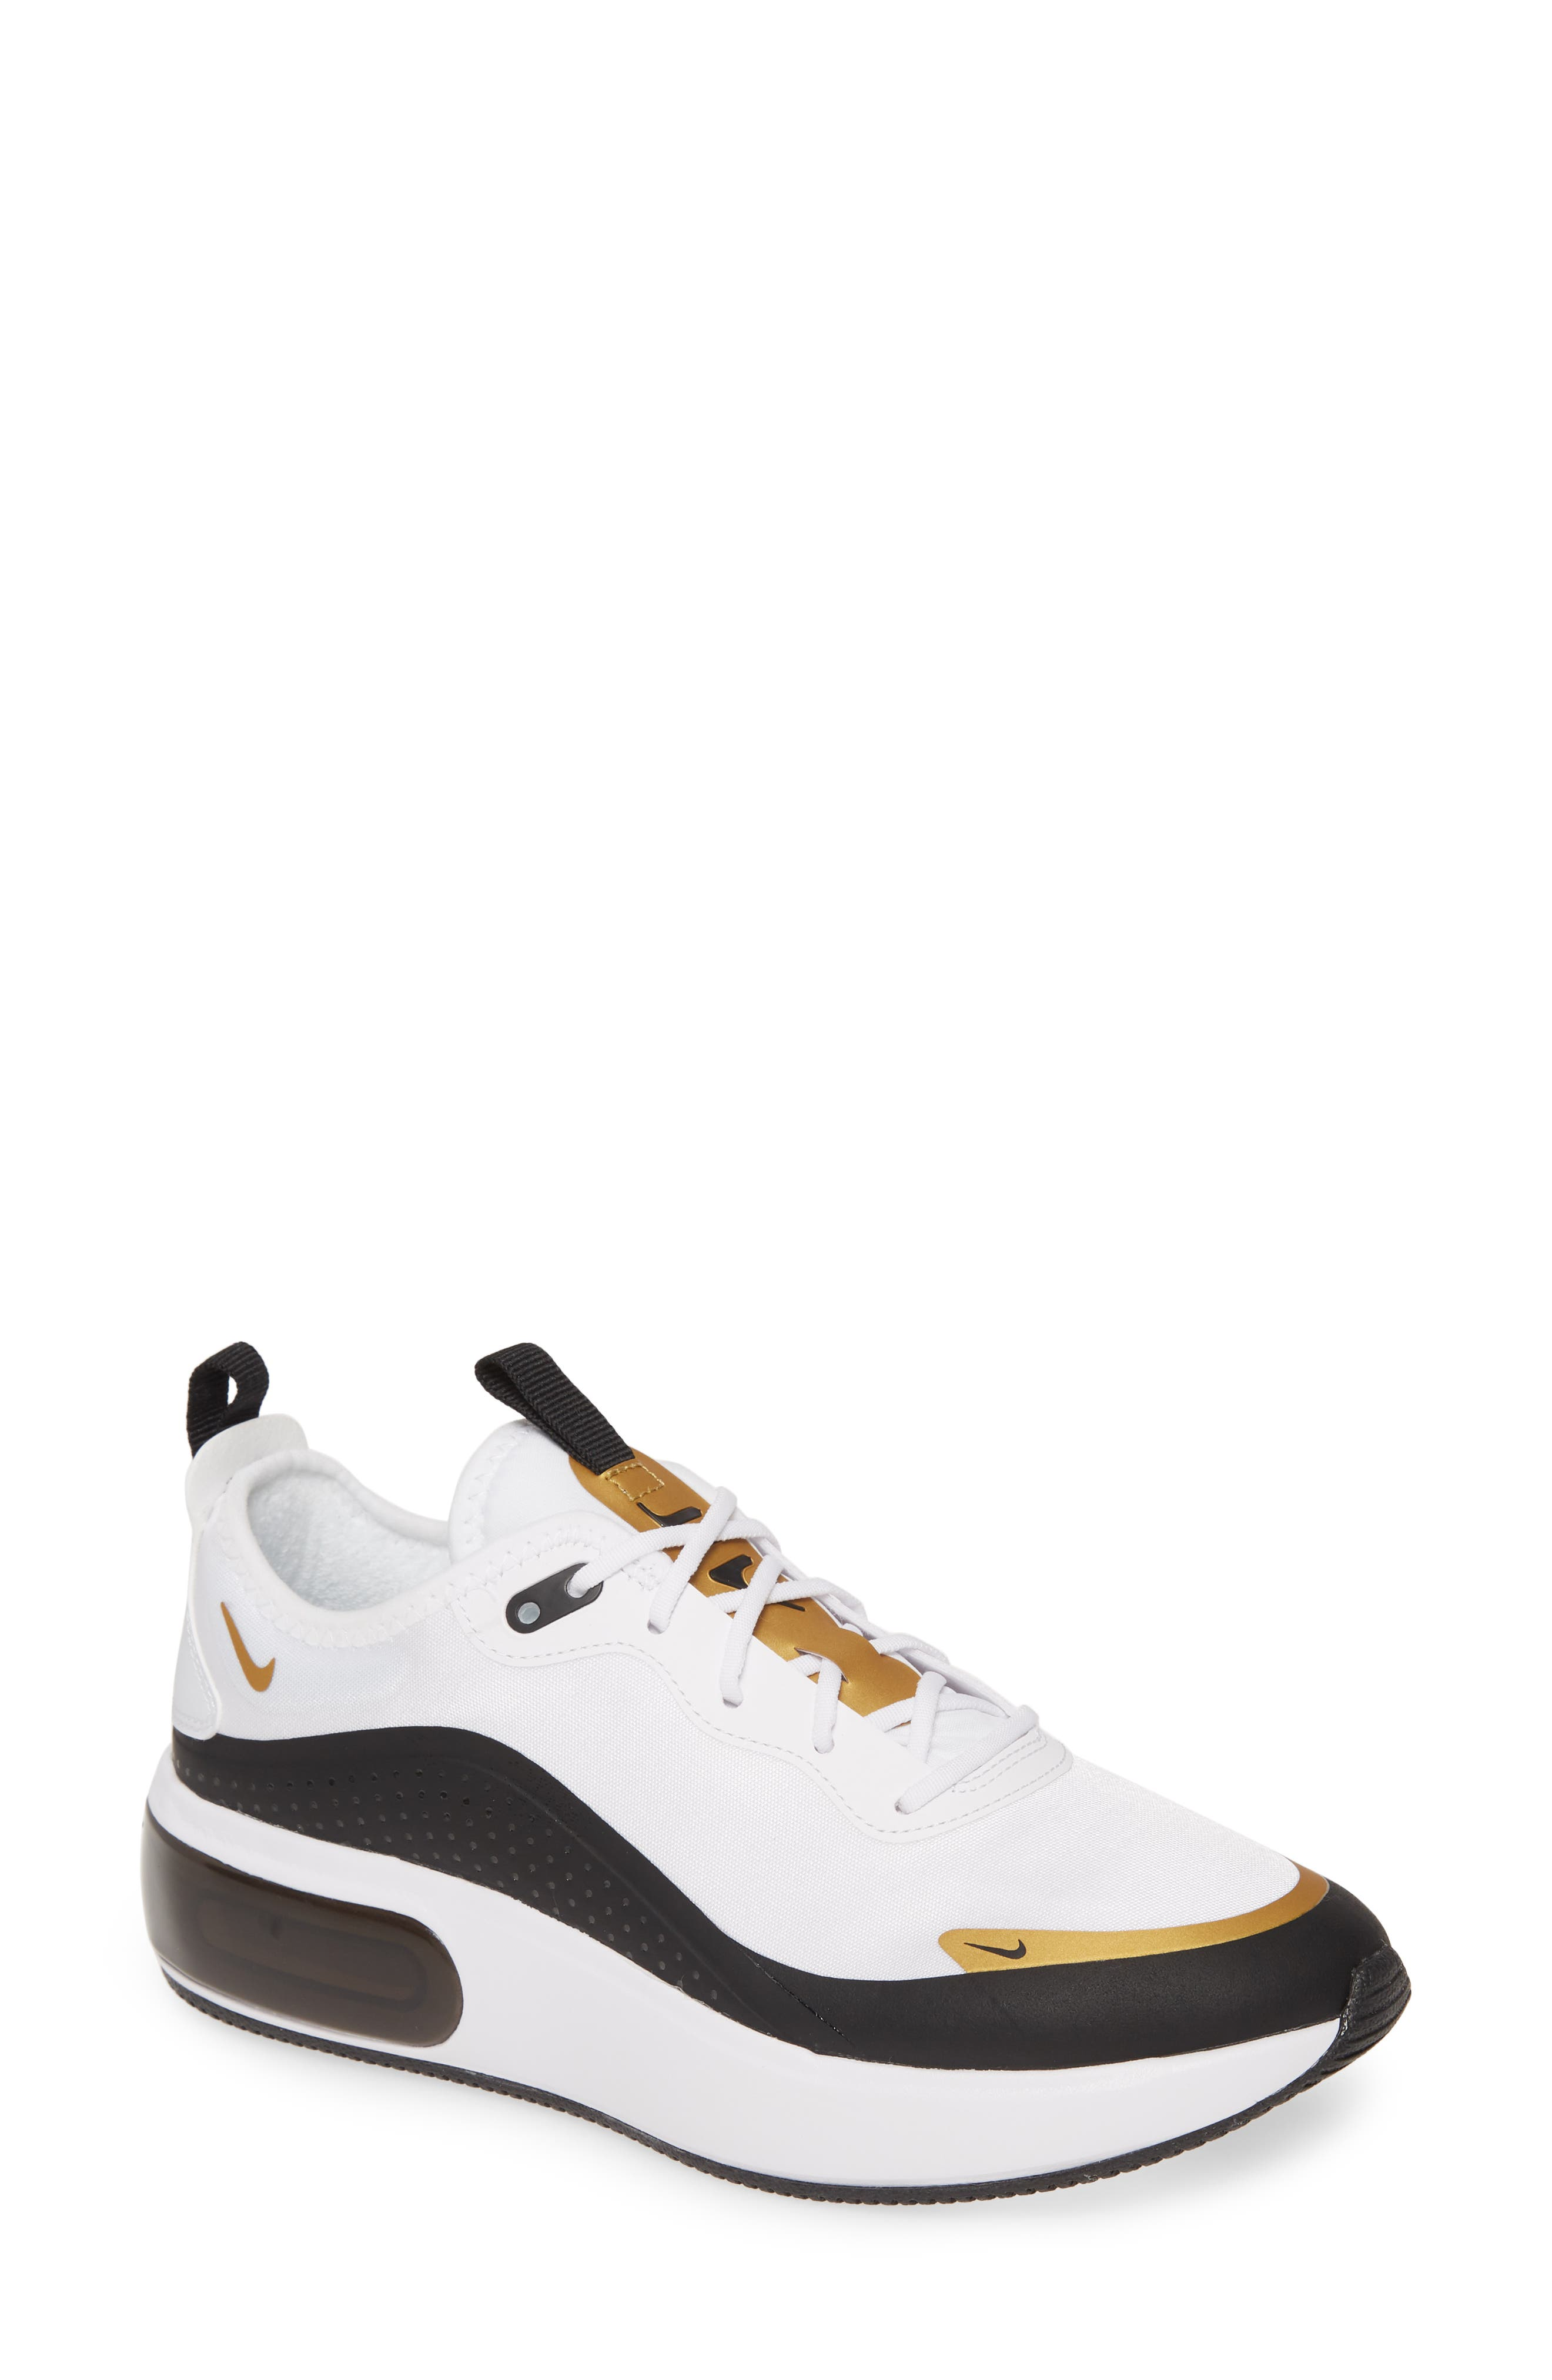 2016 Specific Style Sale Website Free Run Nike Uk Nike Air